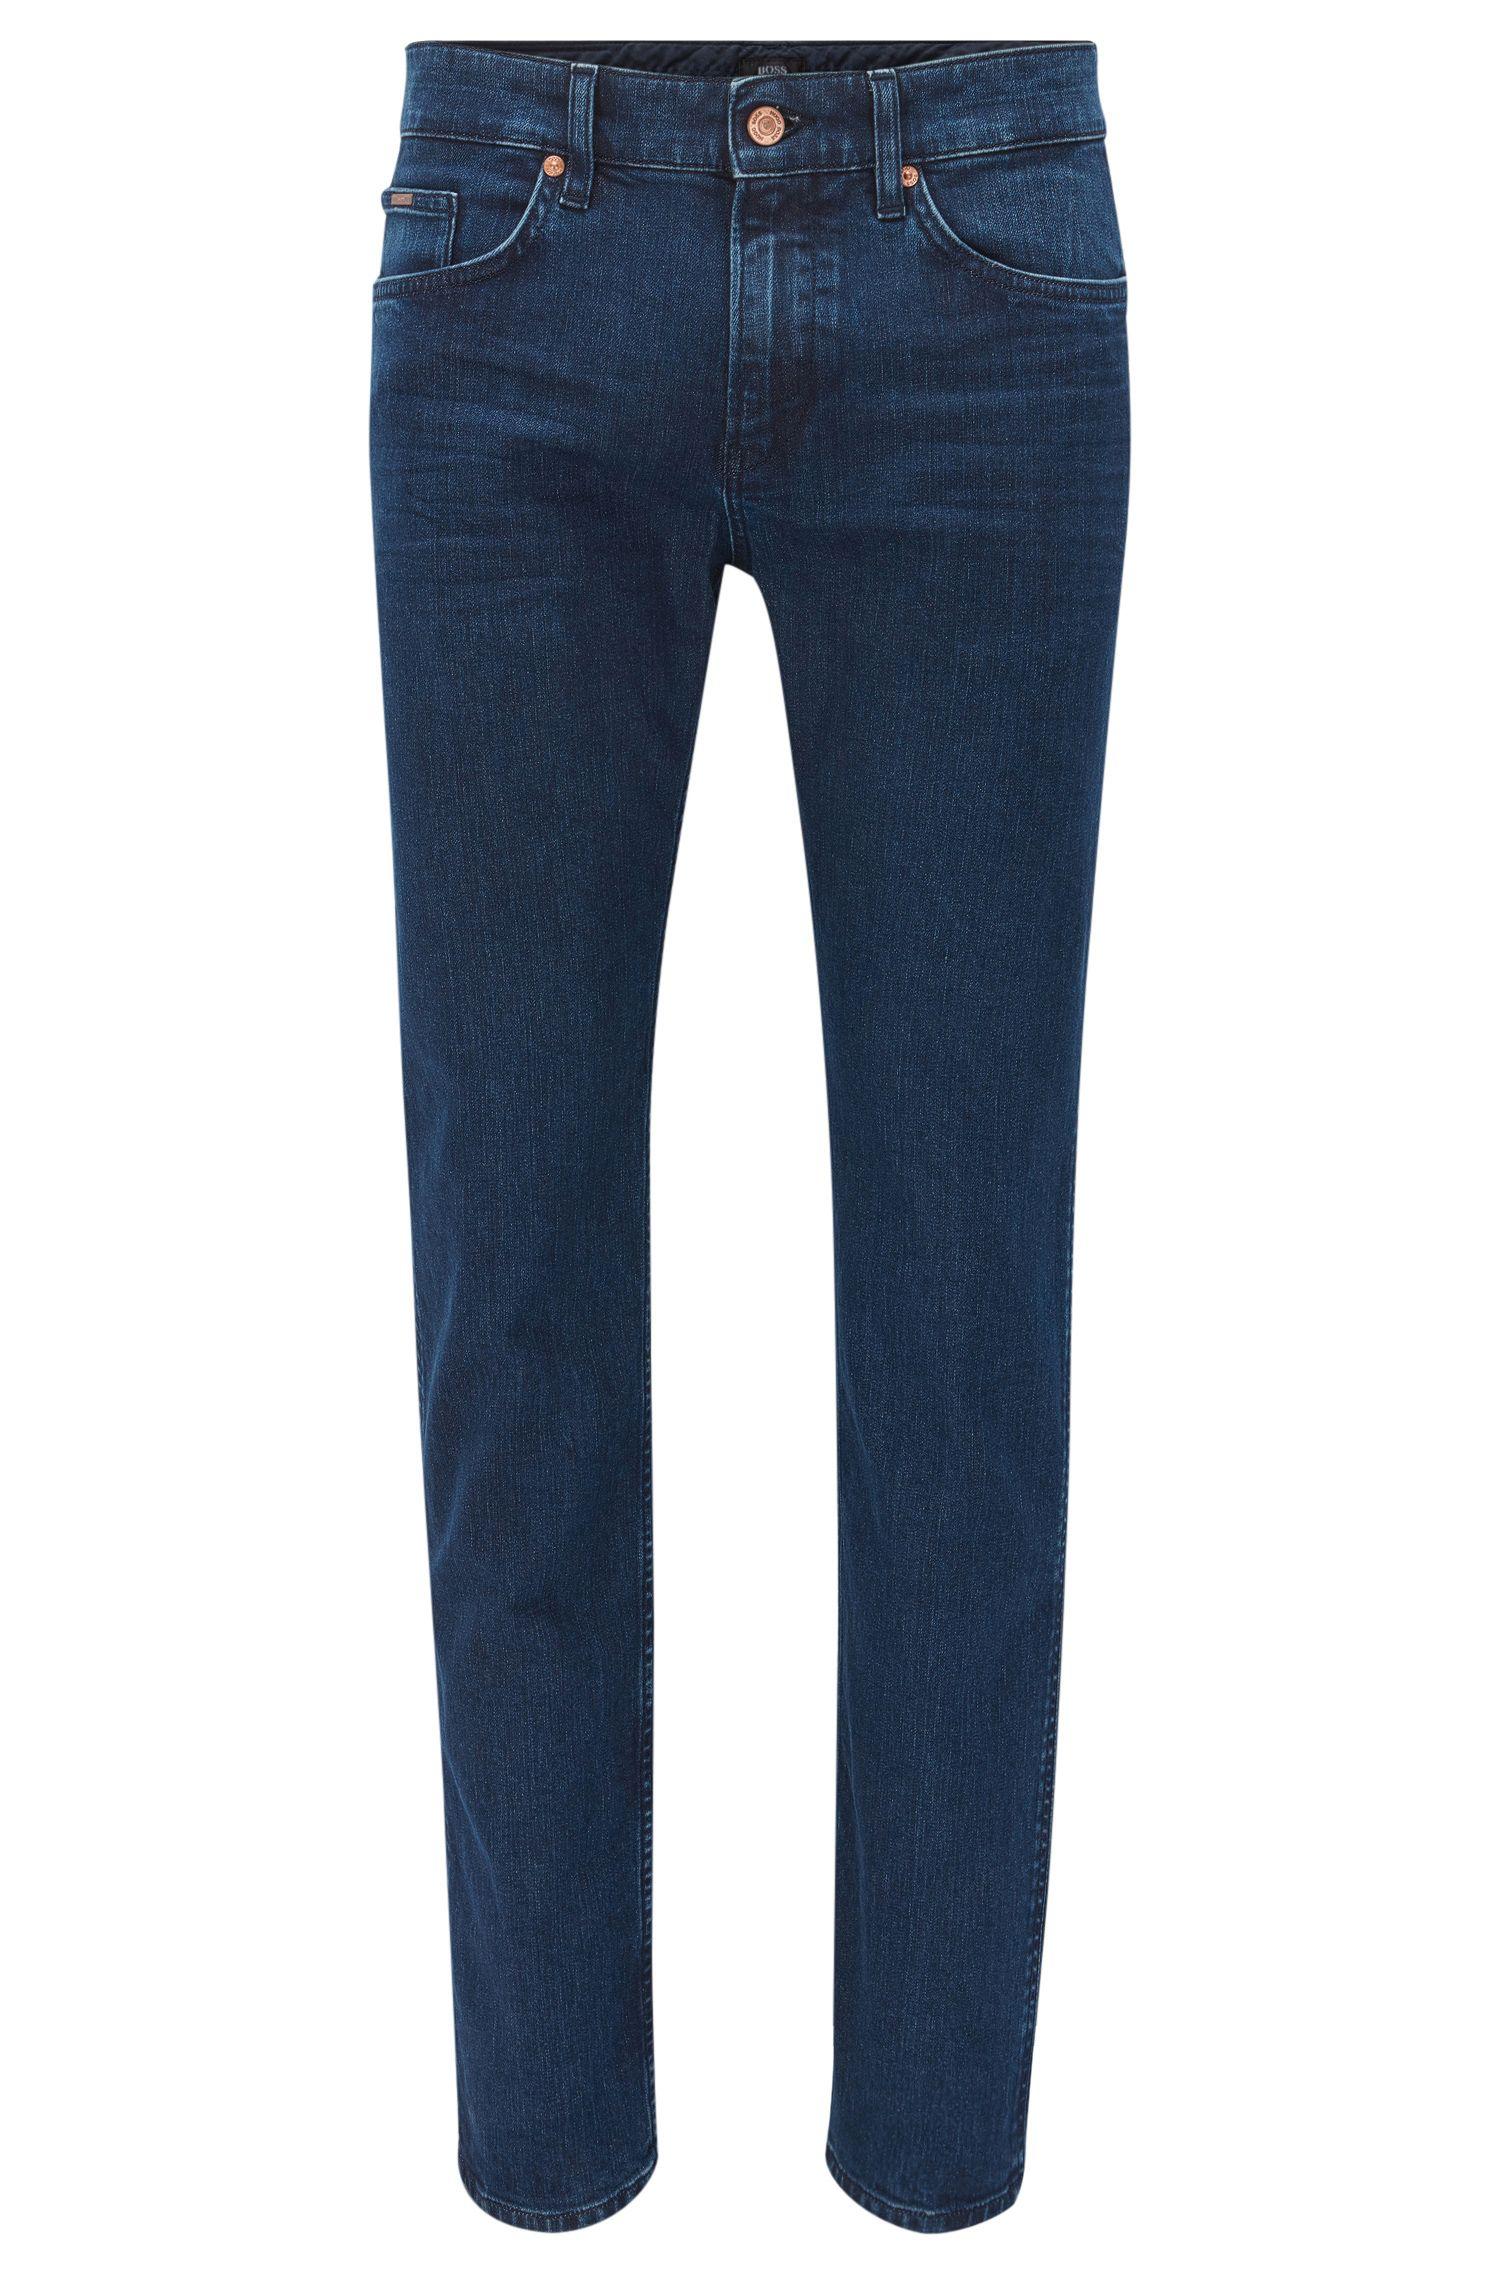 Slim-fit jeans in donker indigo van stretchdenim met normale wassing